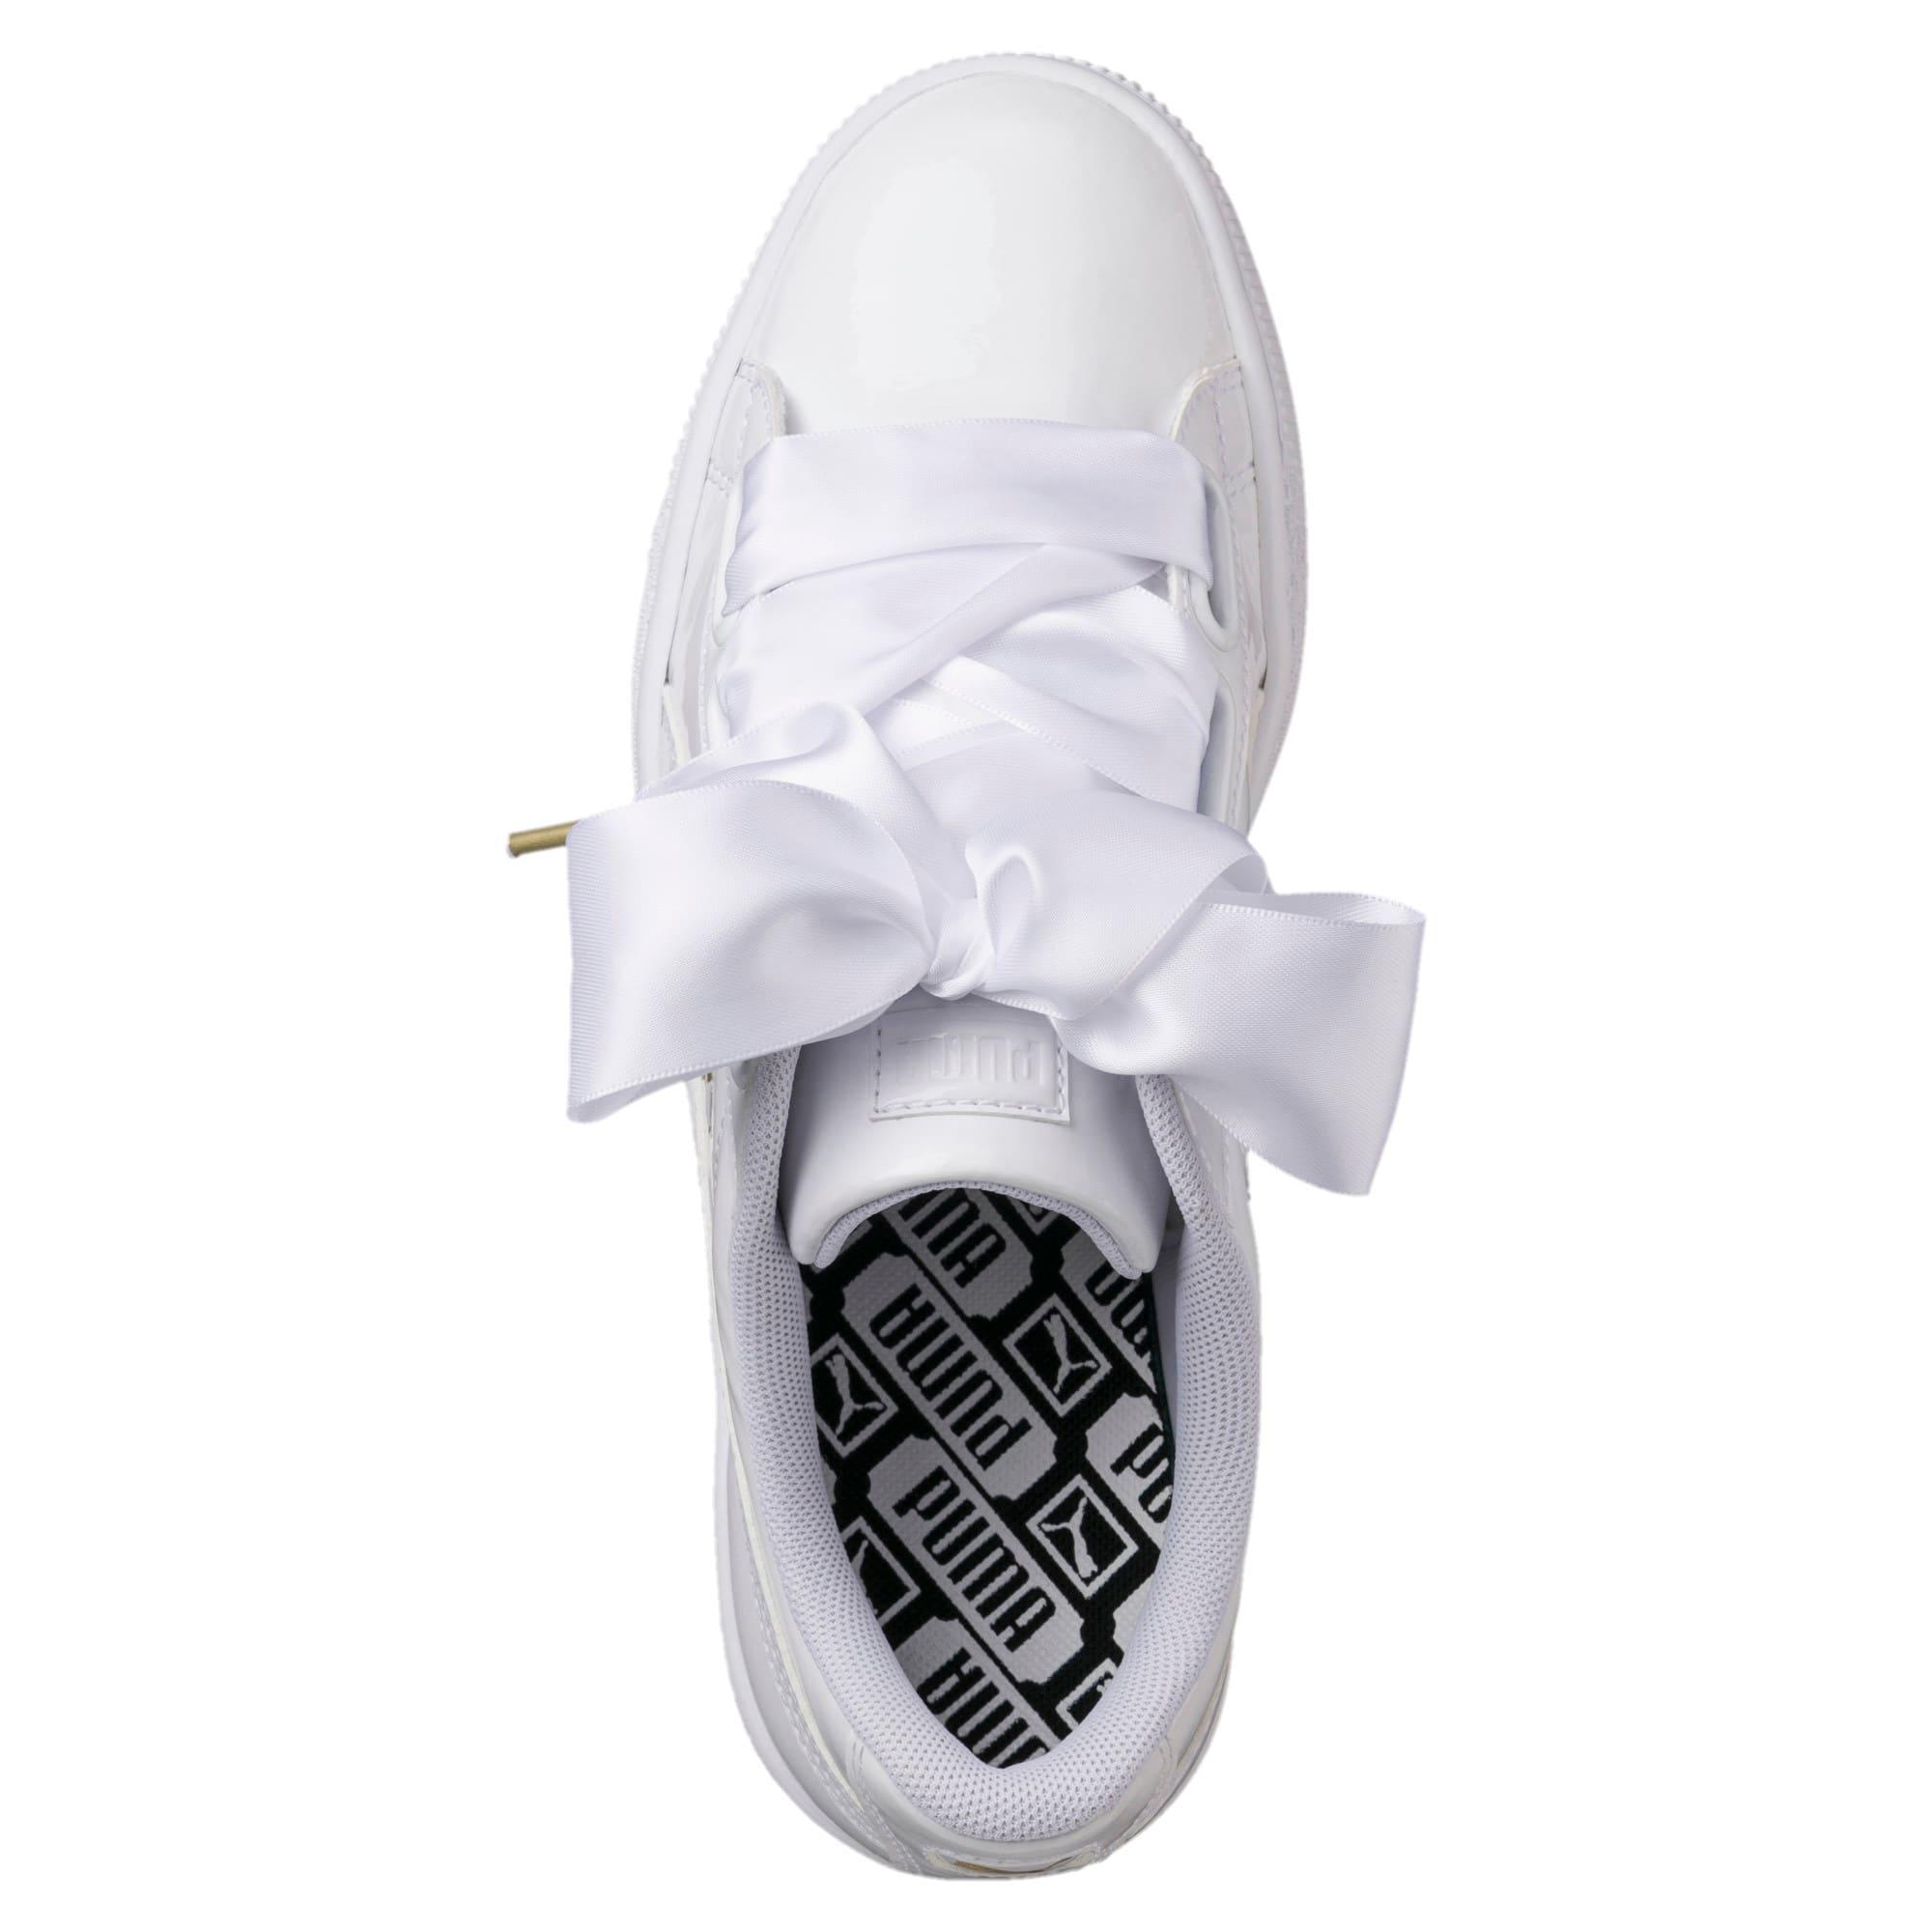 fc0d9c08 Basket Heart Patent Women's Sneakers